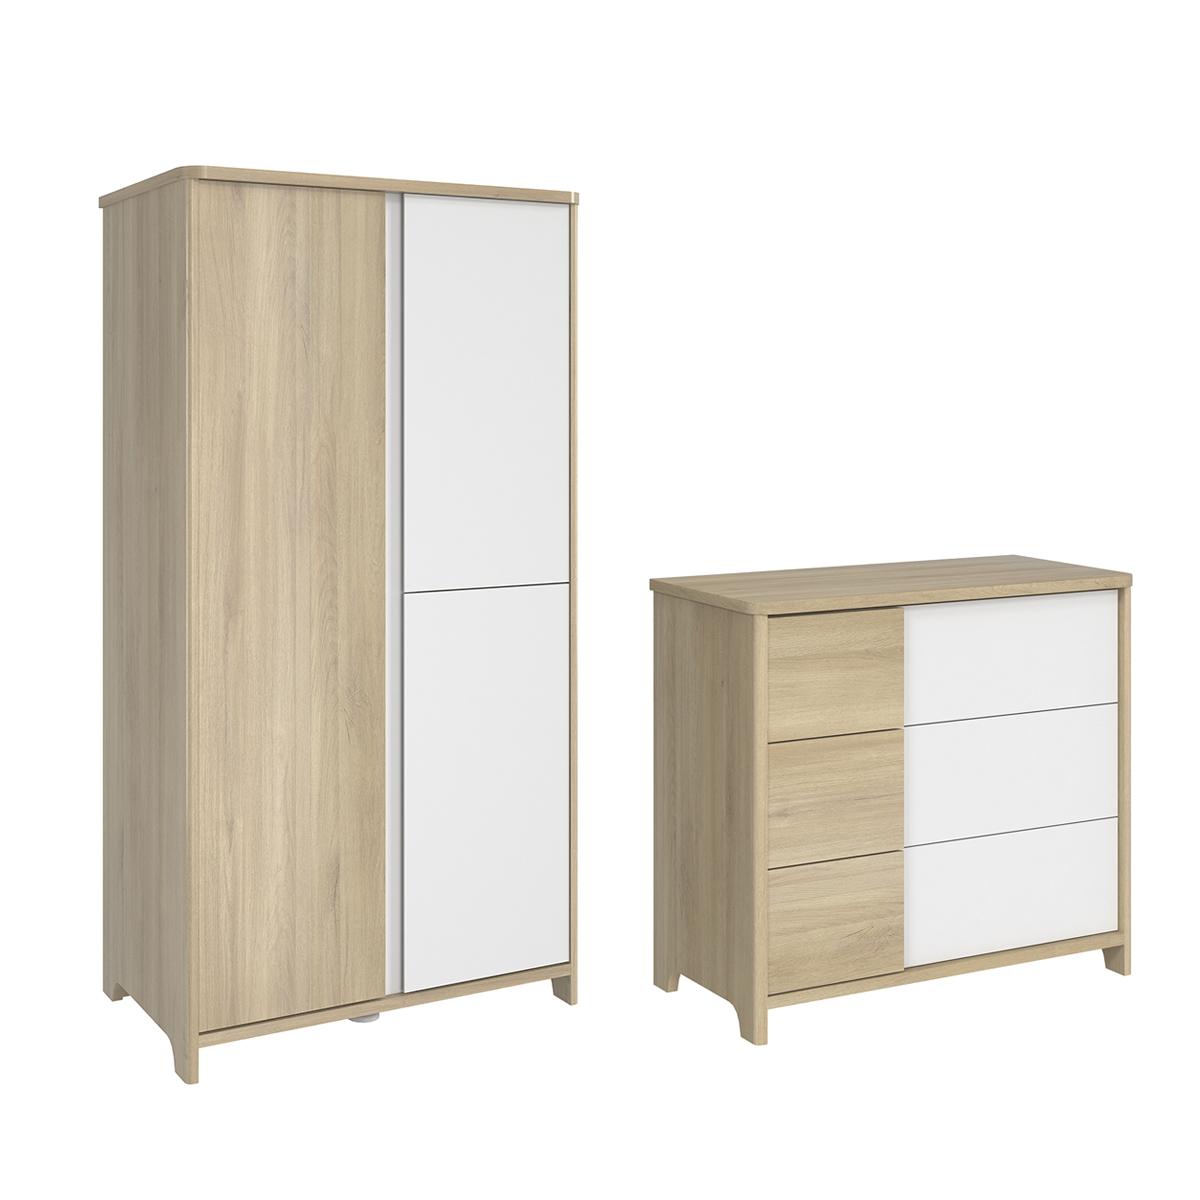 Commode 3 tiroirs et armoire 3 portes Galipette Sacha - Chêne et blanc